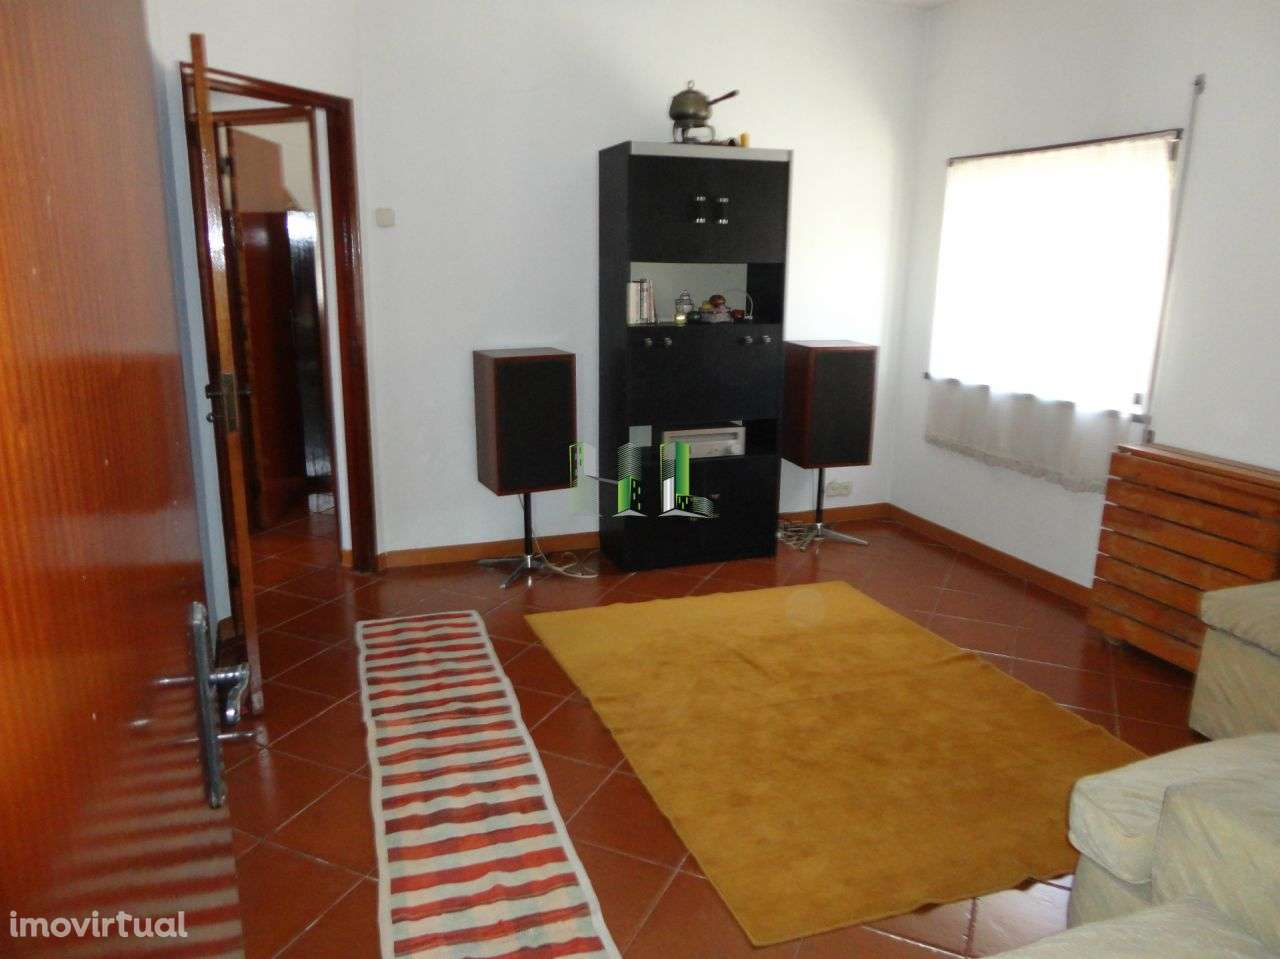 Moradia para comprar, Louriçal, Pombal, Leiria - Foto 6